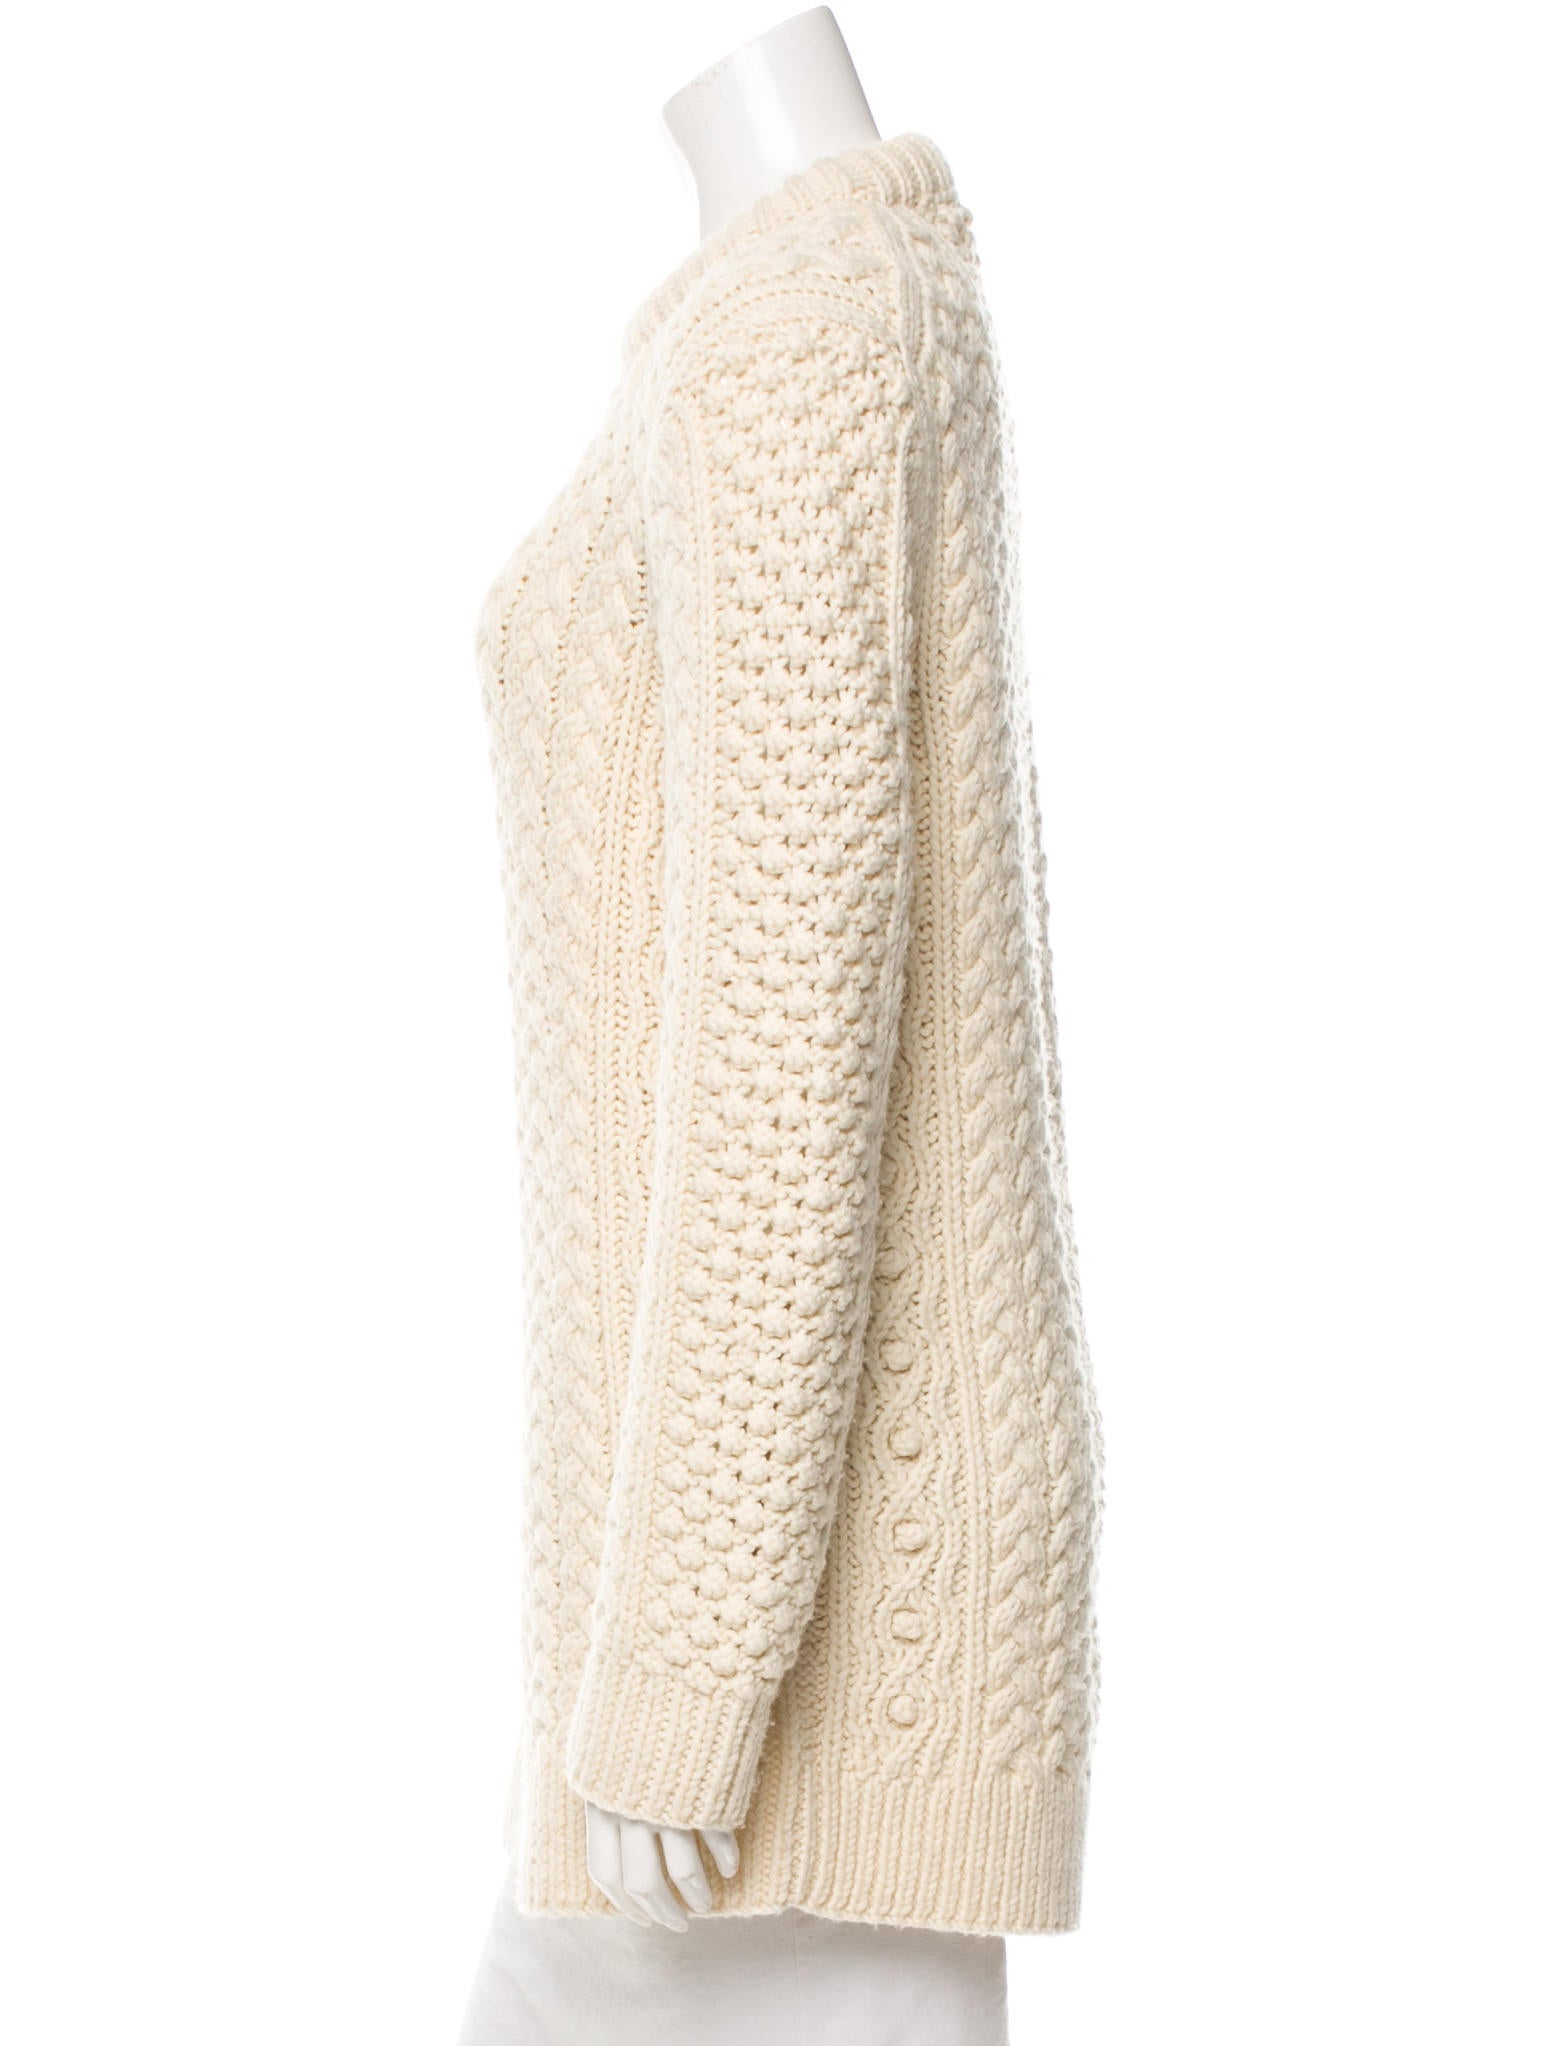 Knitting Organizer Michaels : Michael kors cable knit wool sweater clothing mic